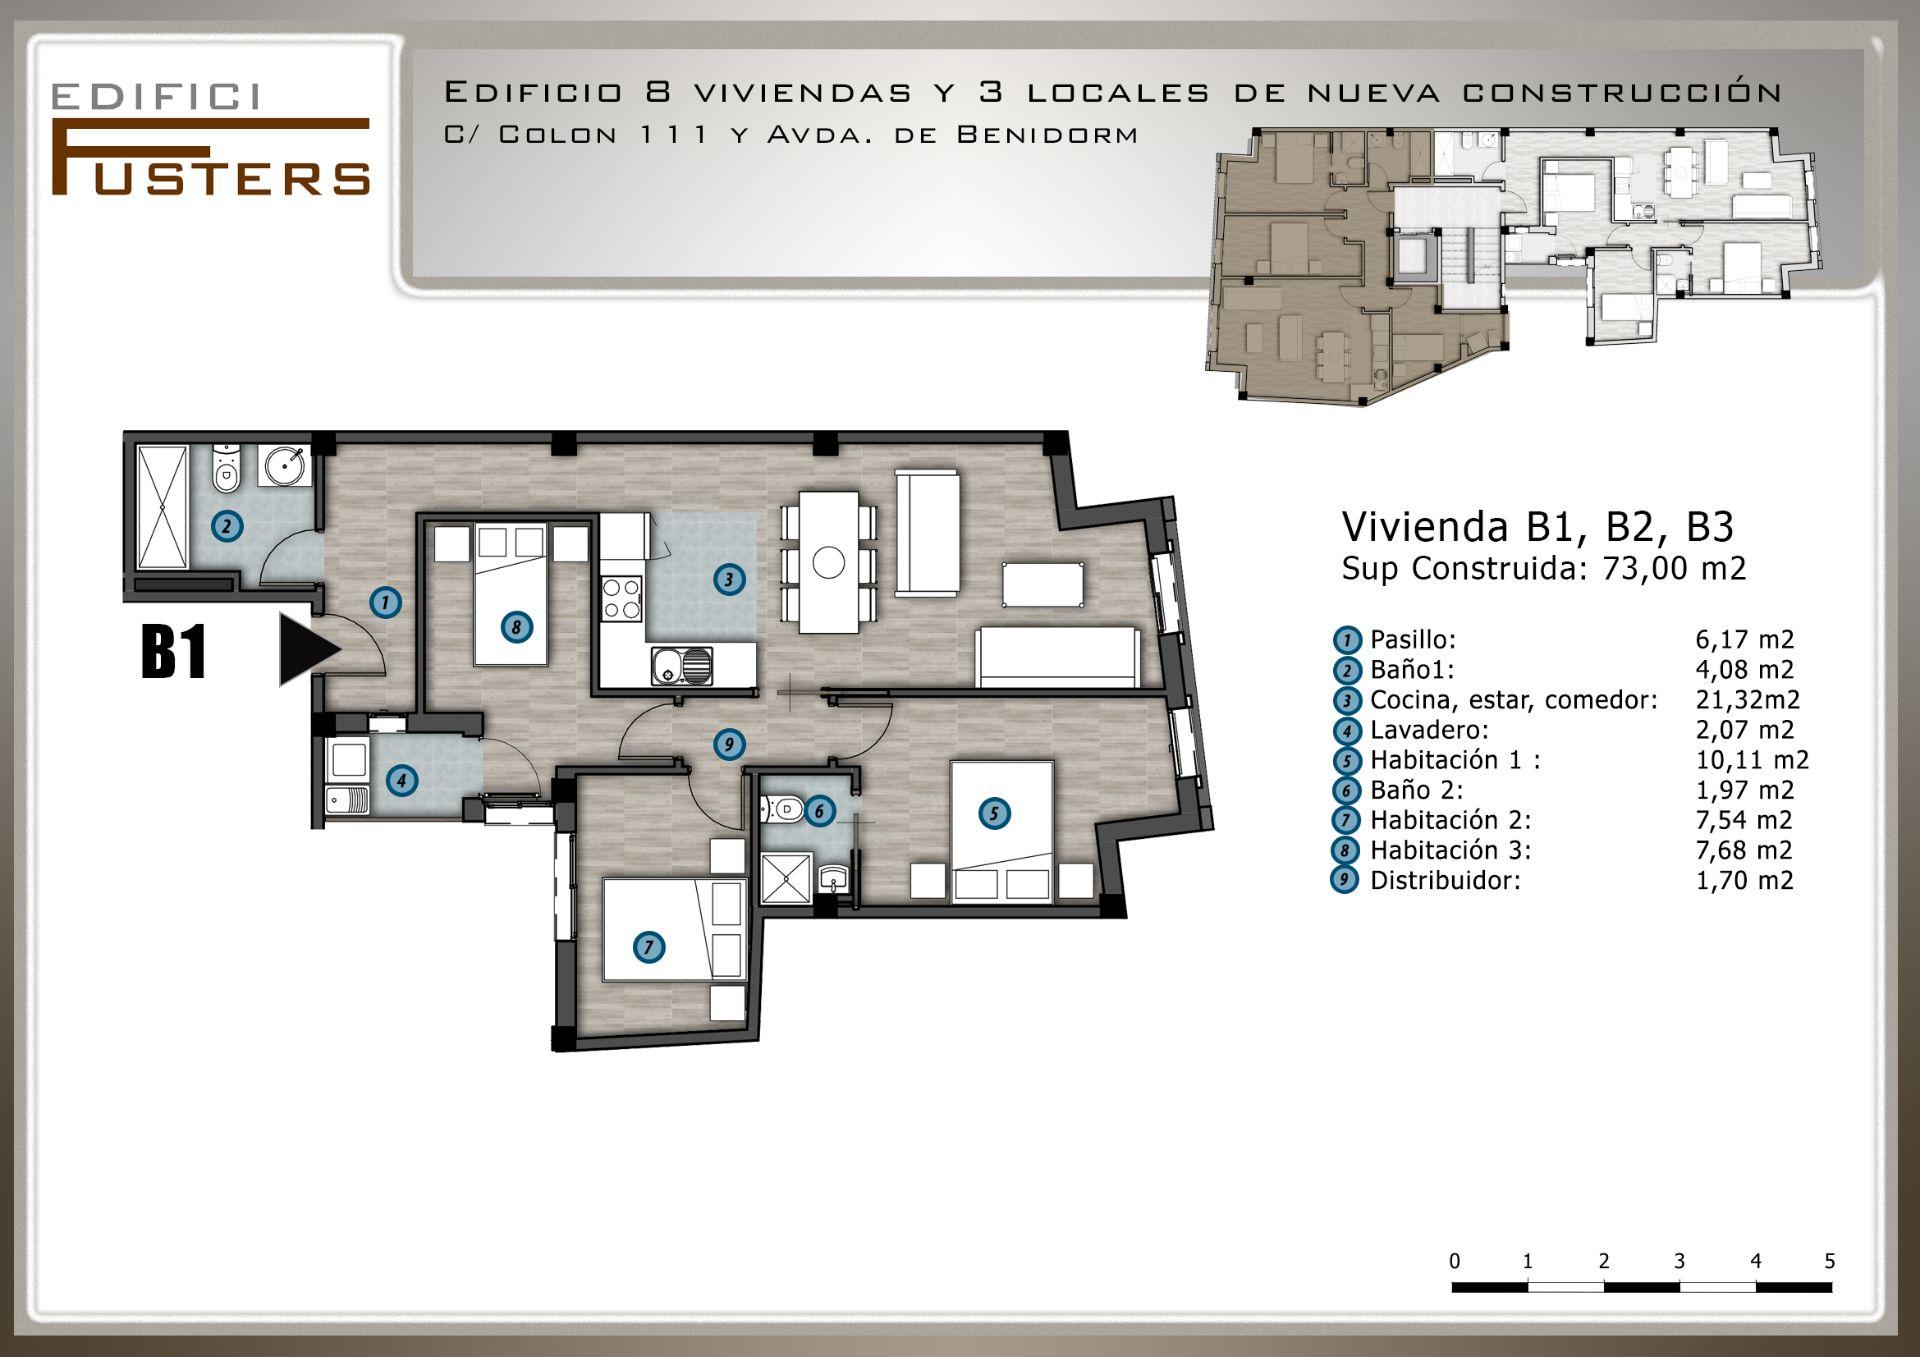 Leilighet i Villajoyosa, salg